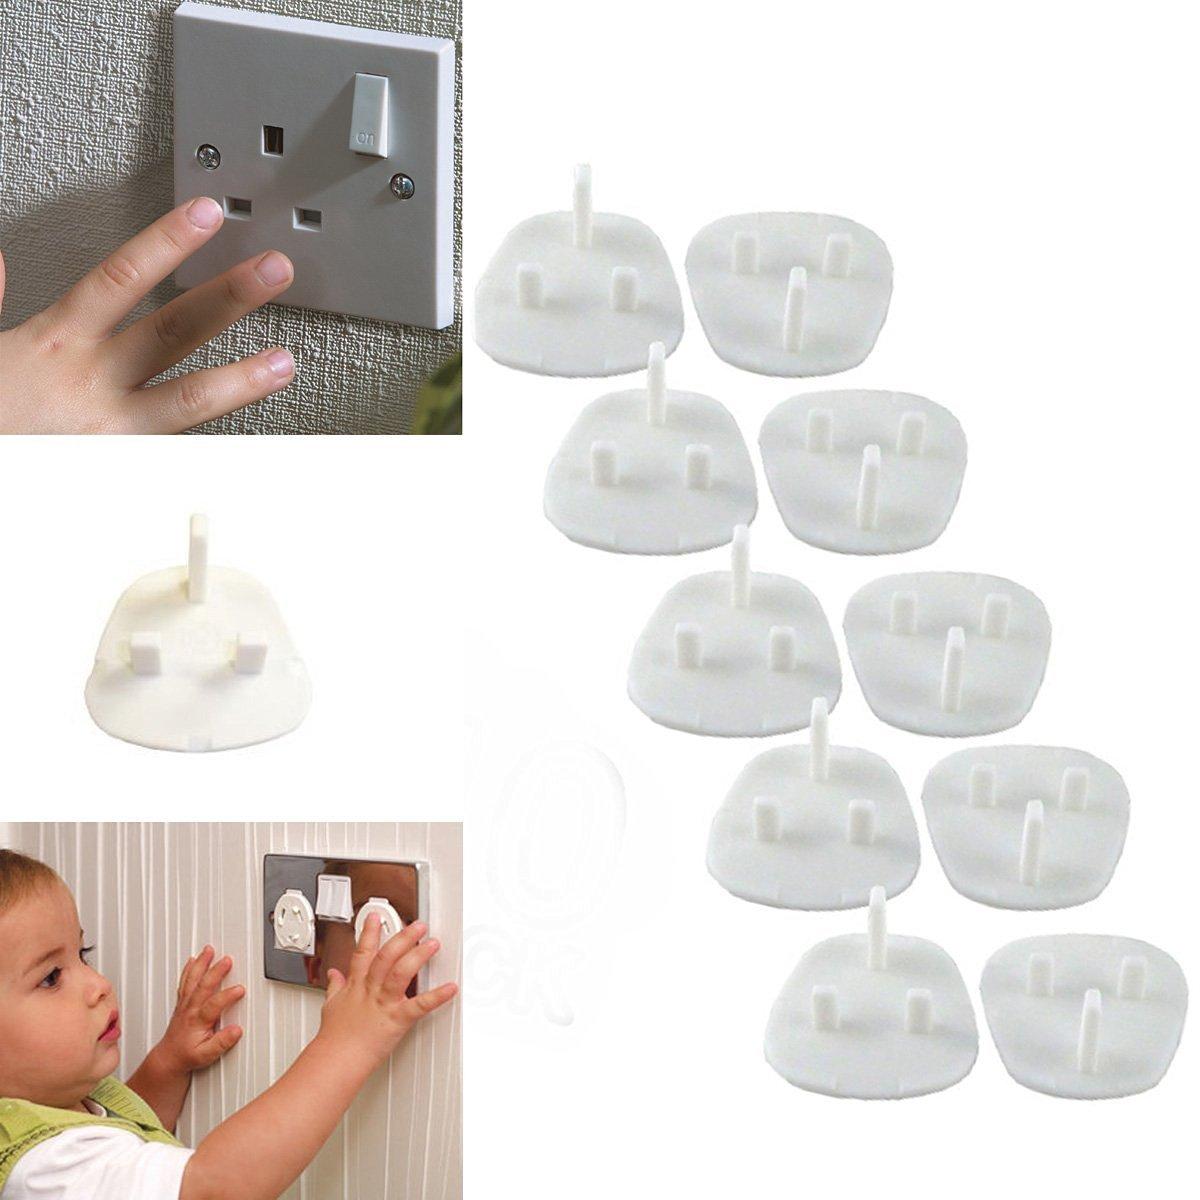 plug-cover